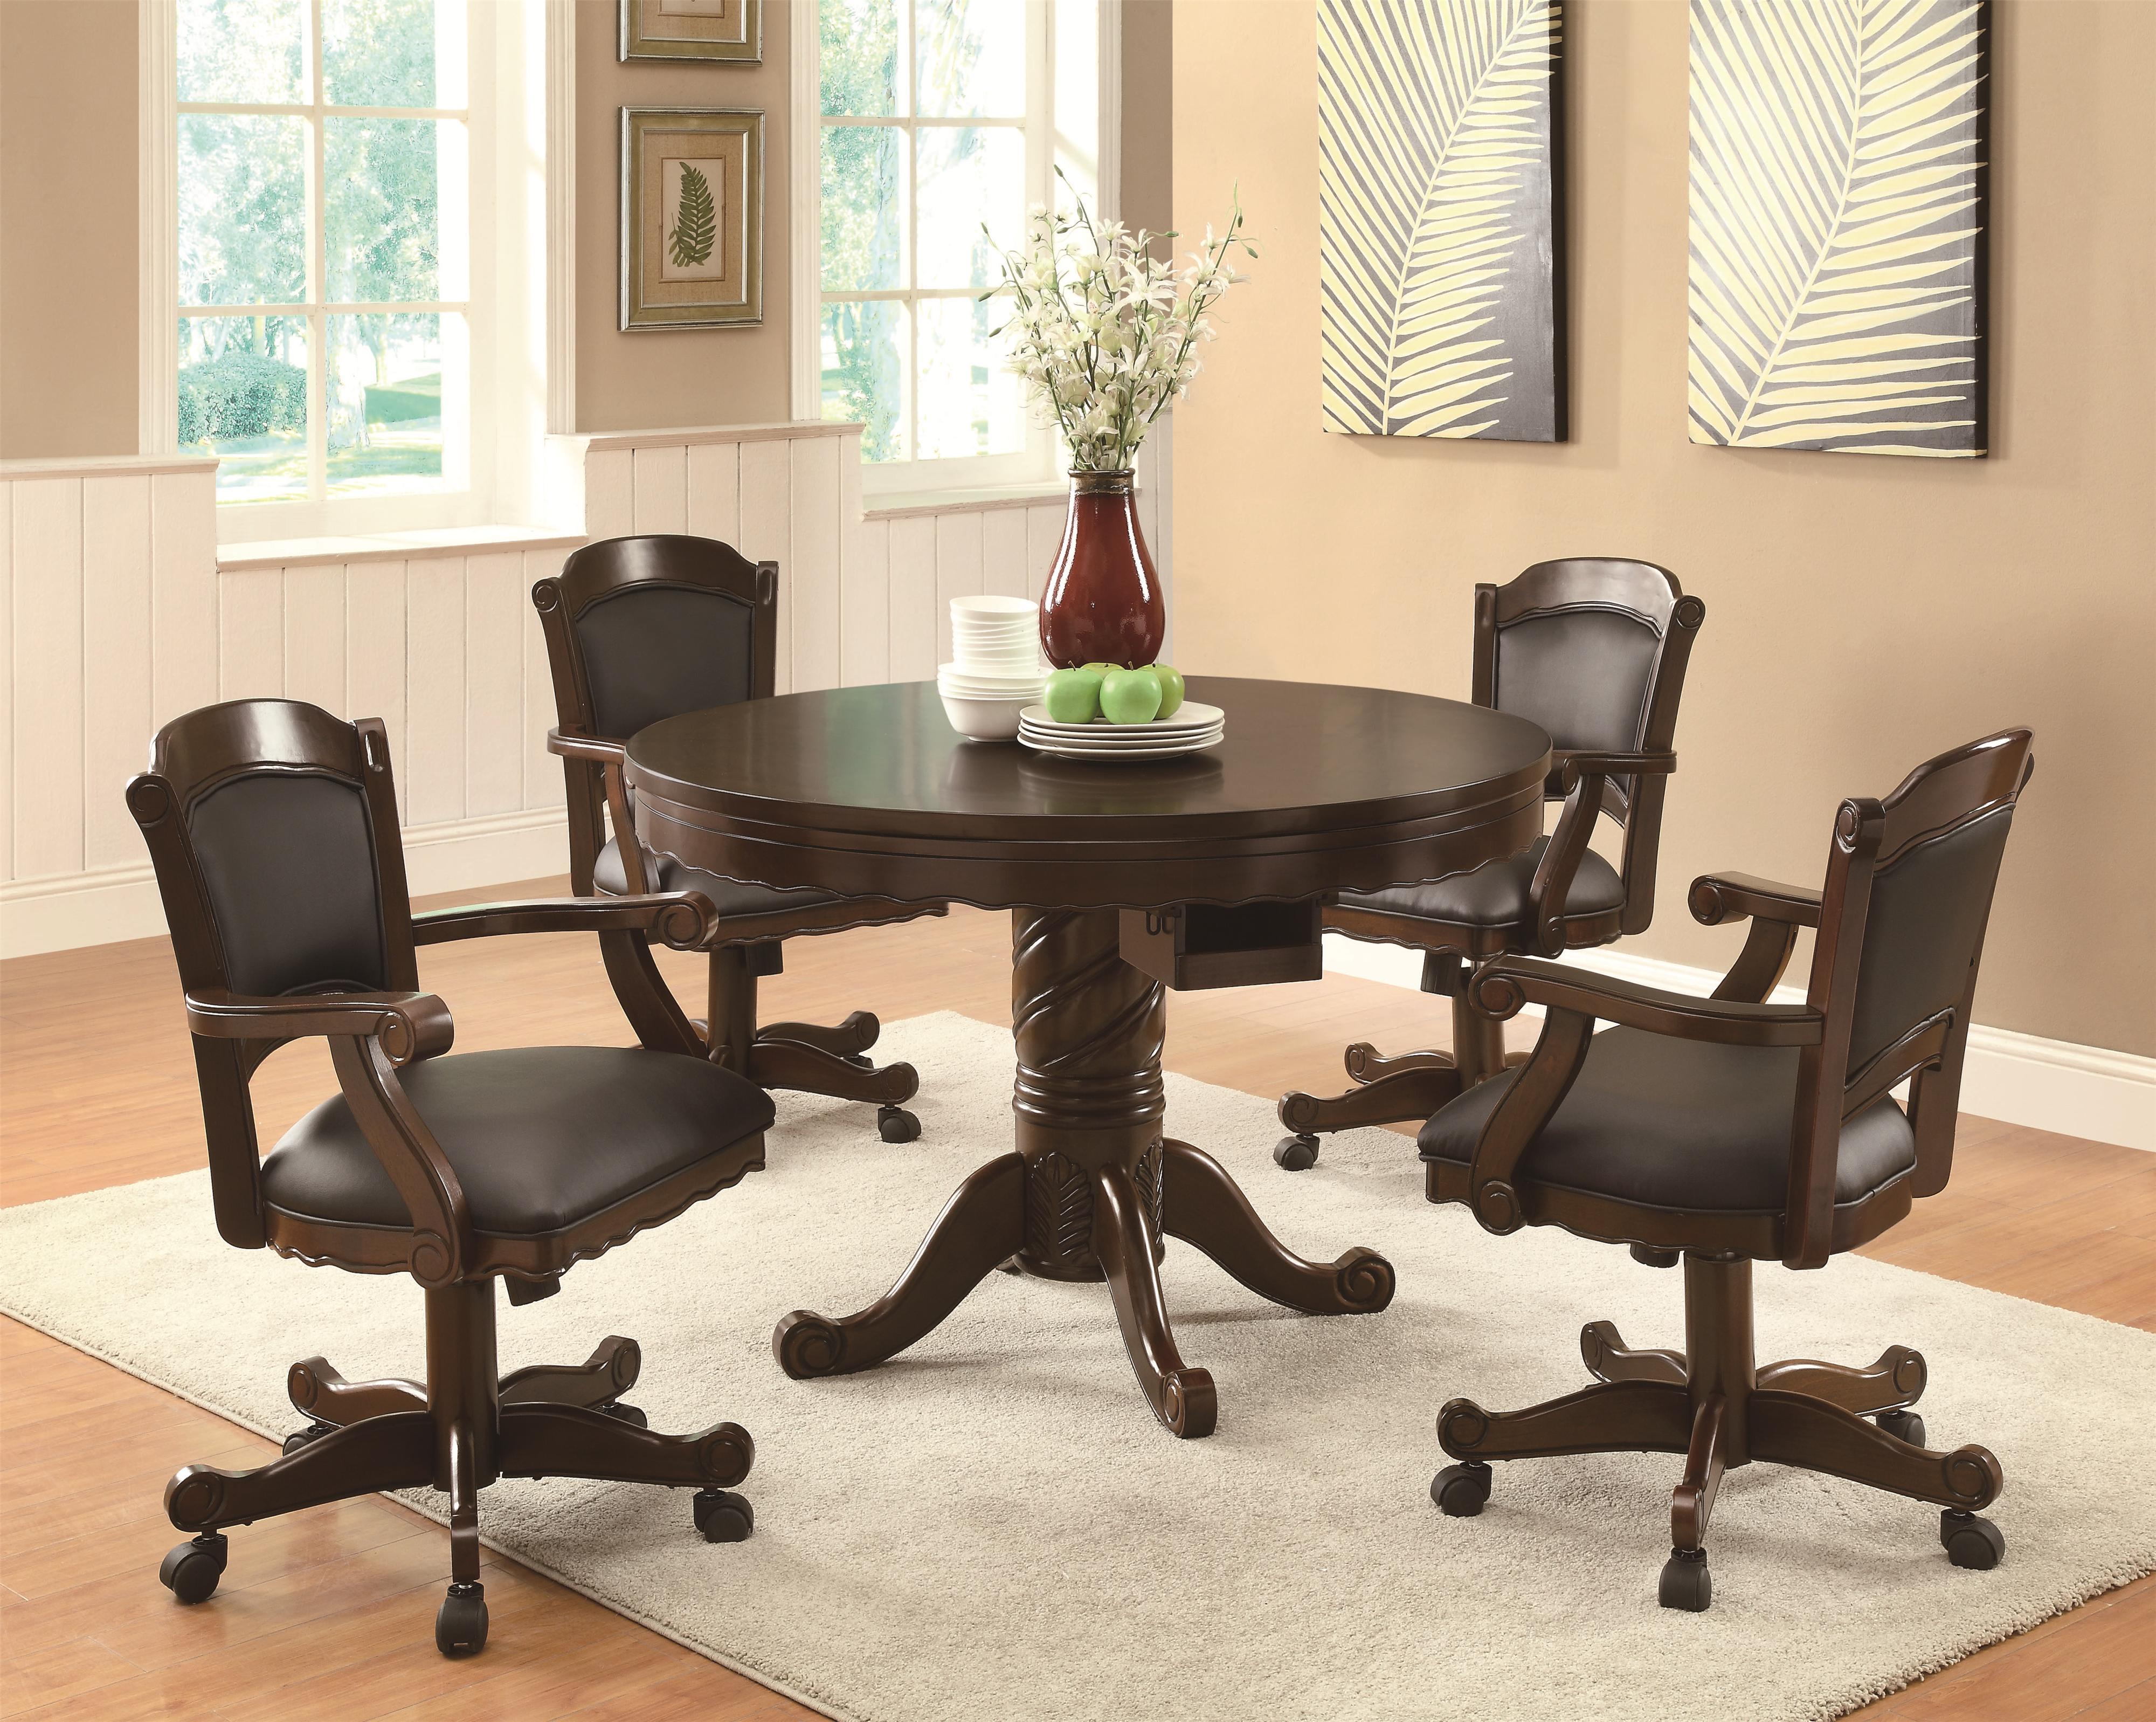 Coaster Turk 3-in-1 Round Pedestal Game Table - Coaster Fine Furniture